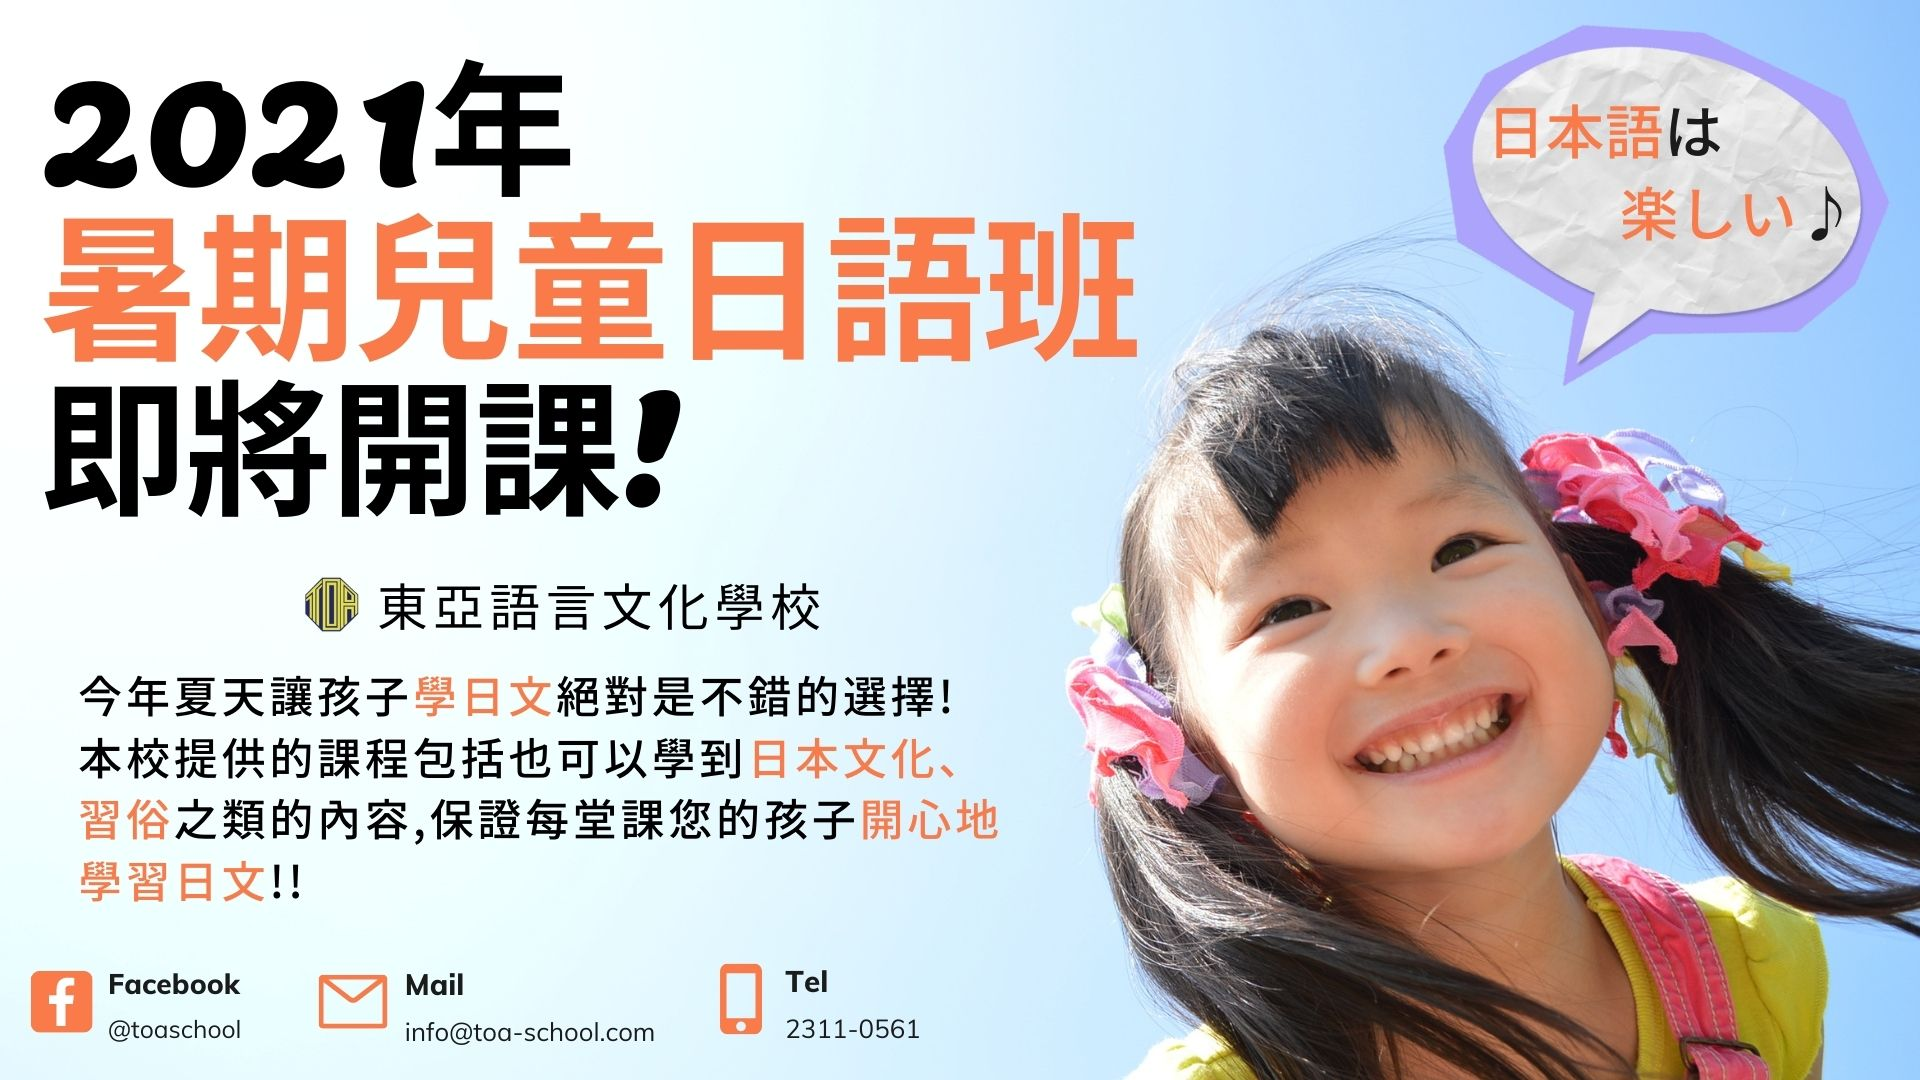 hongkong toa japanese school kids summer course 香港 東亞 日文 日本語 學日文 兒童日語 暑期日語班